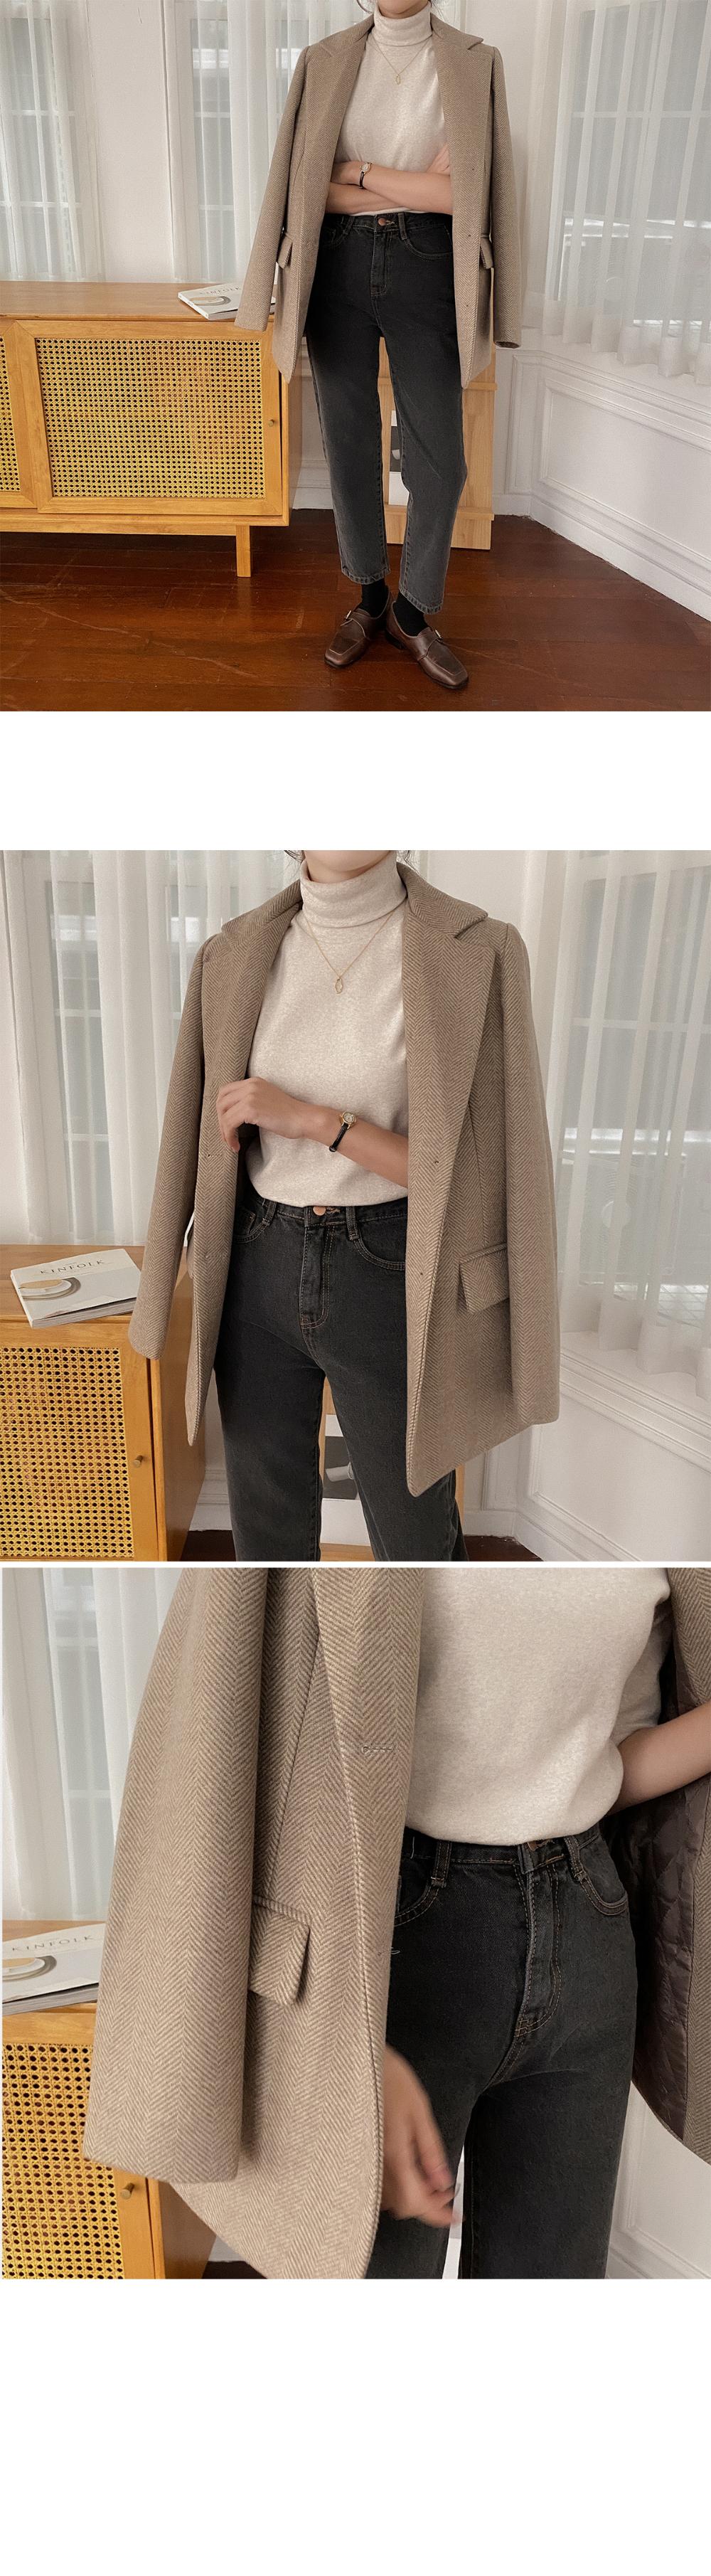 205 Semi Baggy Denim Pants-2color